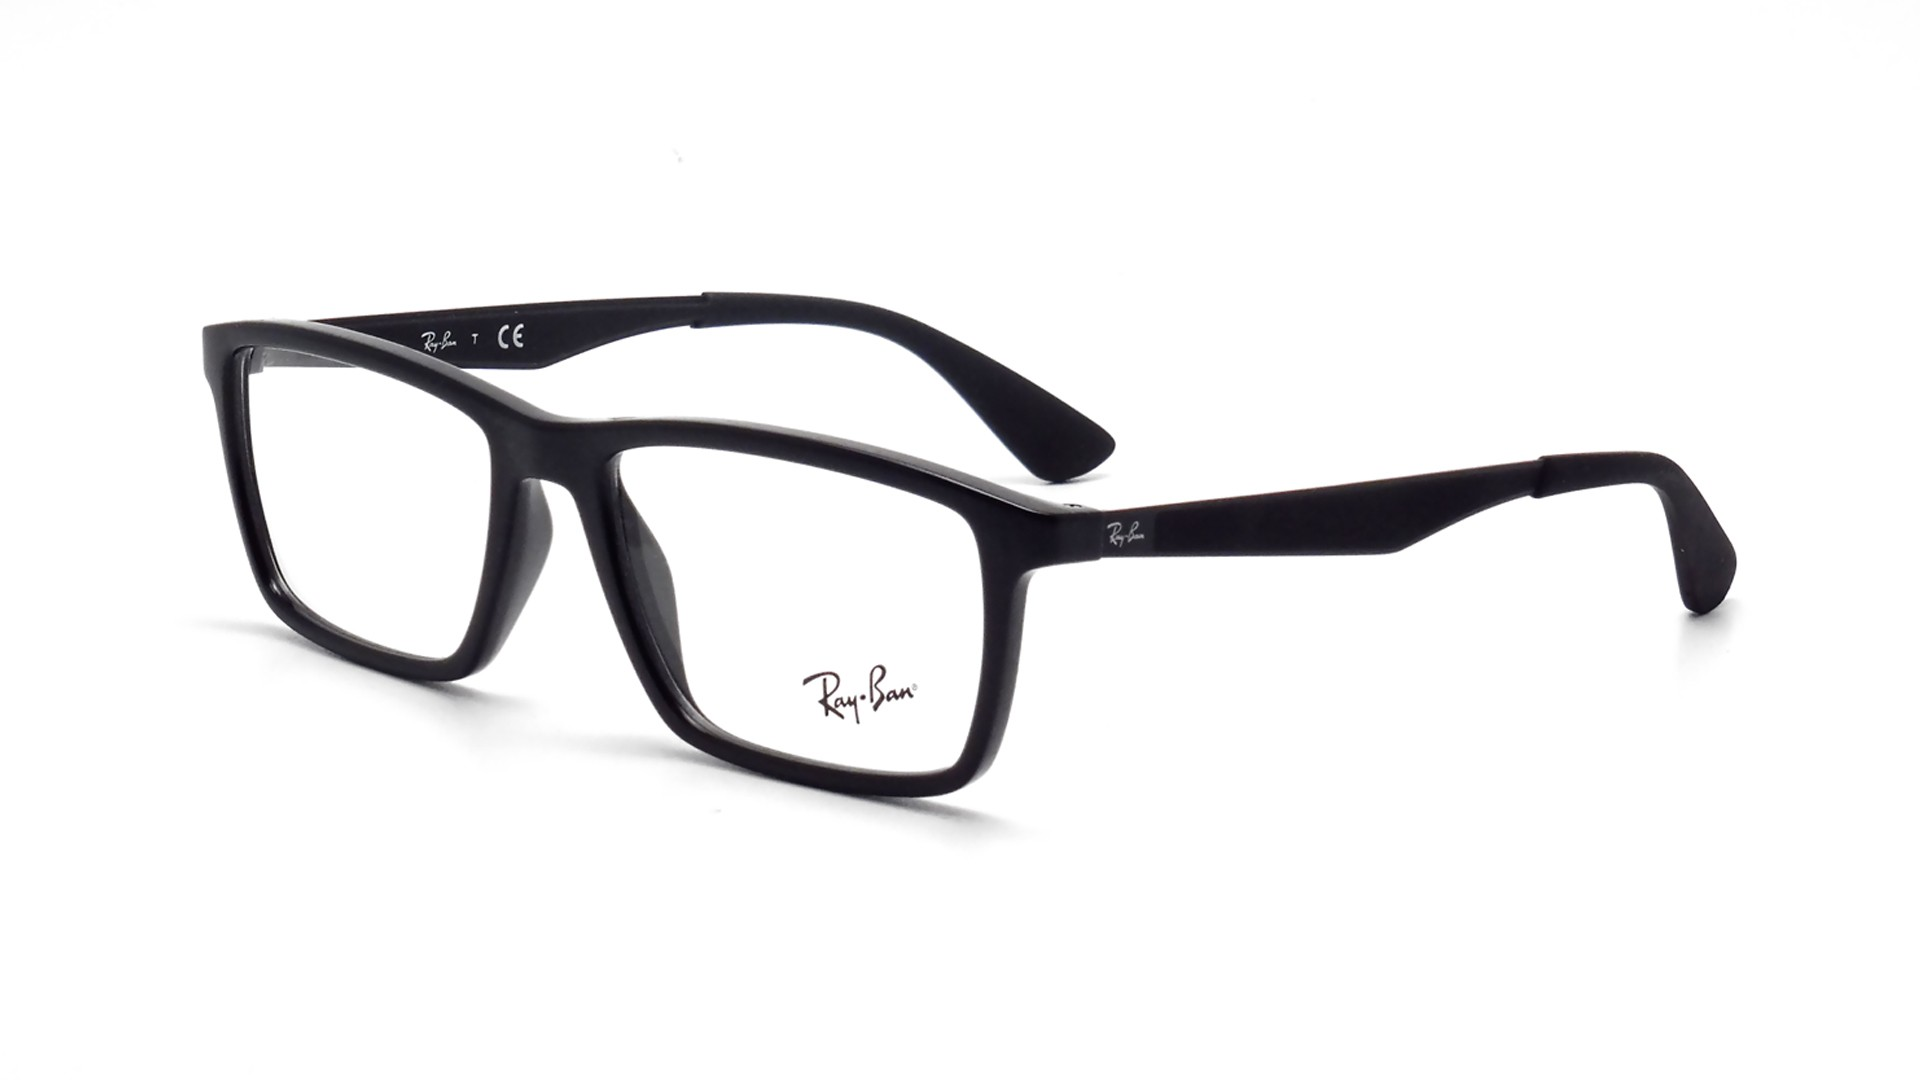 042ef6af676 Eyeglasses Ray-Ban RX7056 RB7056 2000 53-17 Black Medium